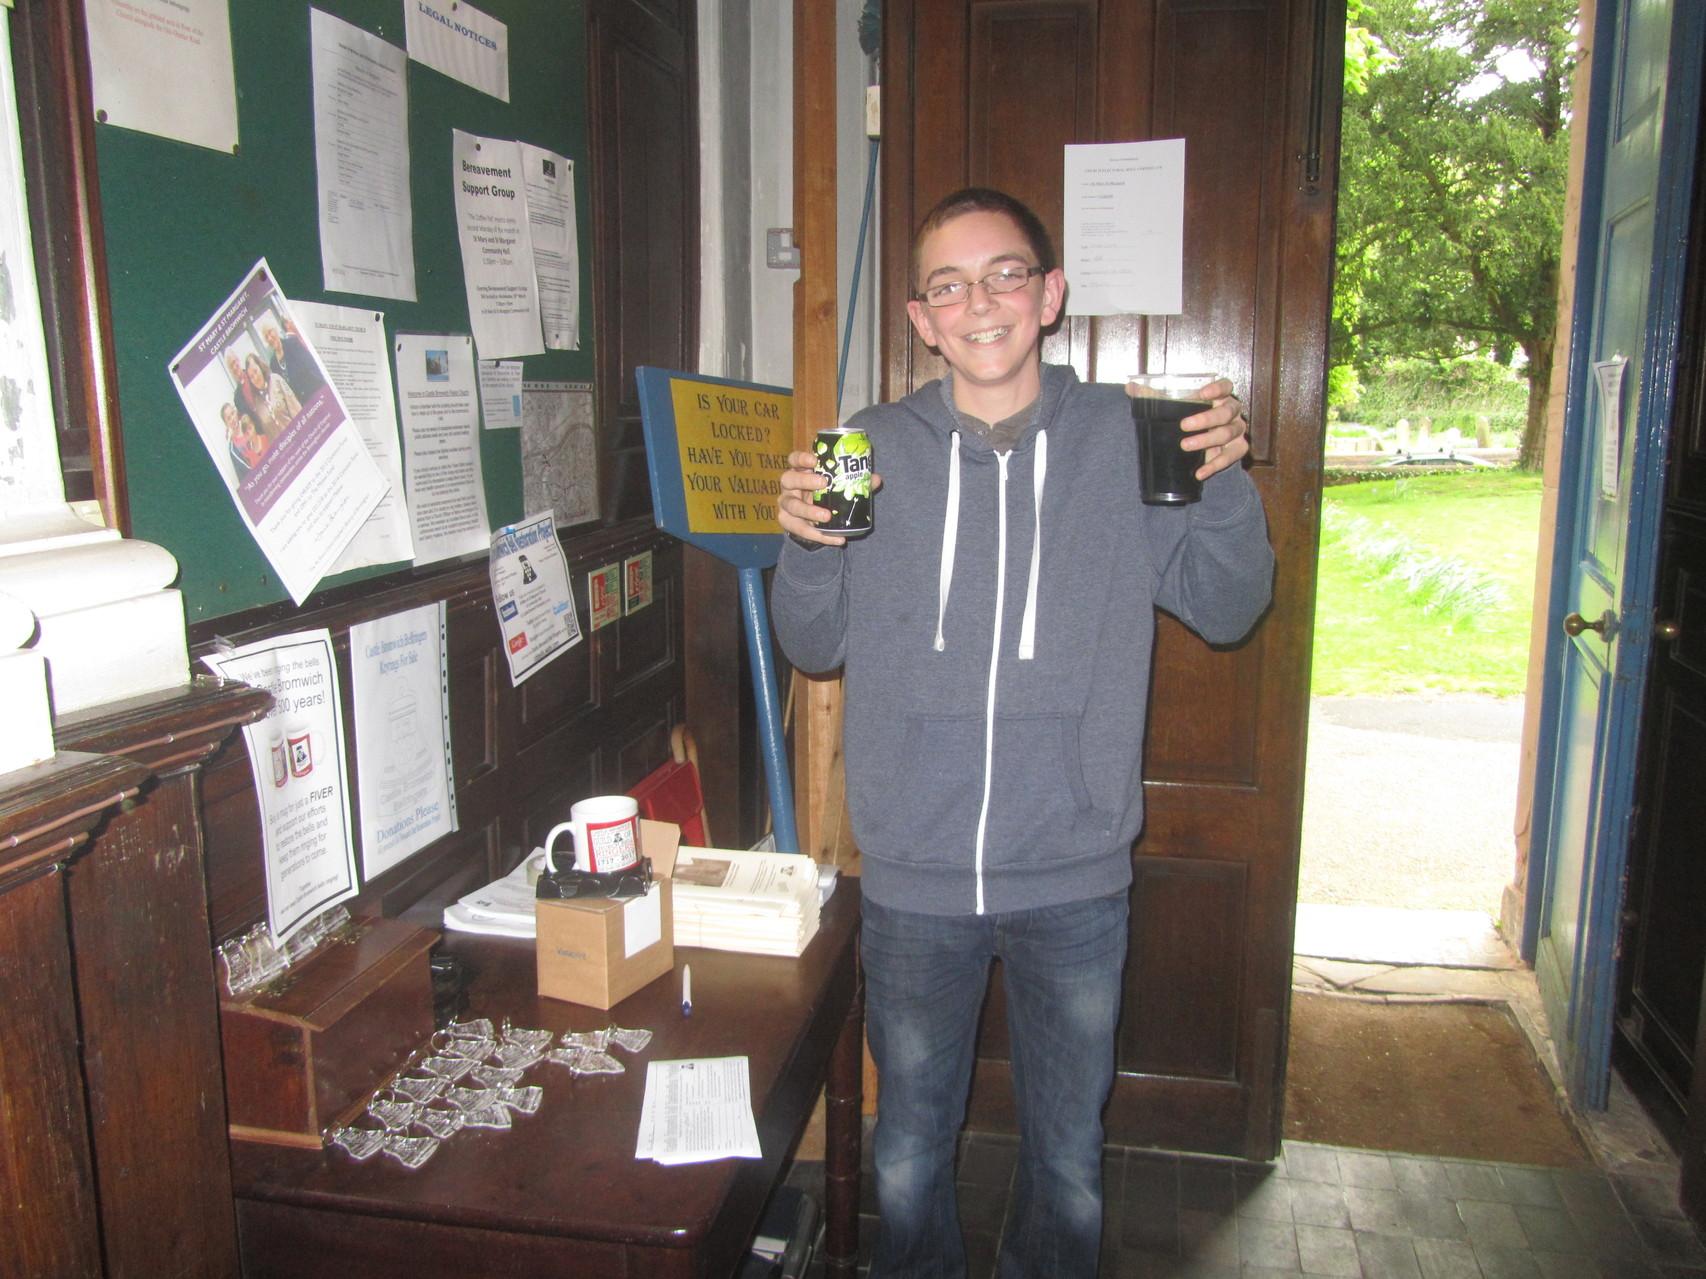 Castle Bromwich Heritage Festival salesman